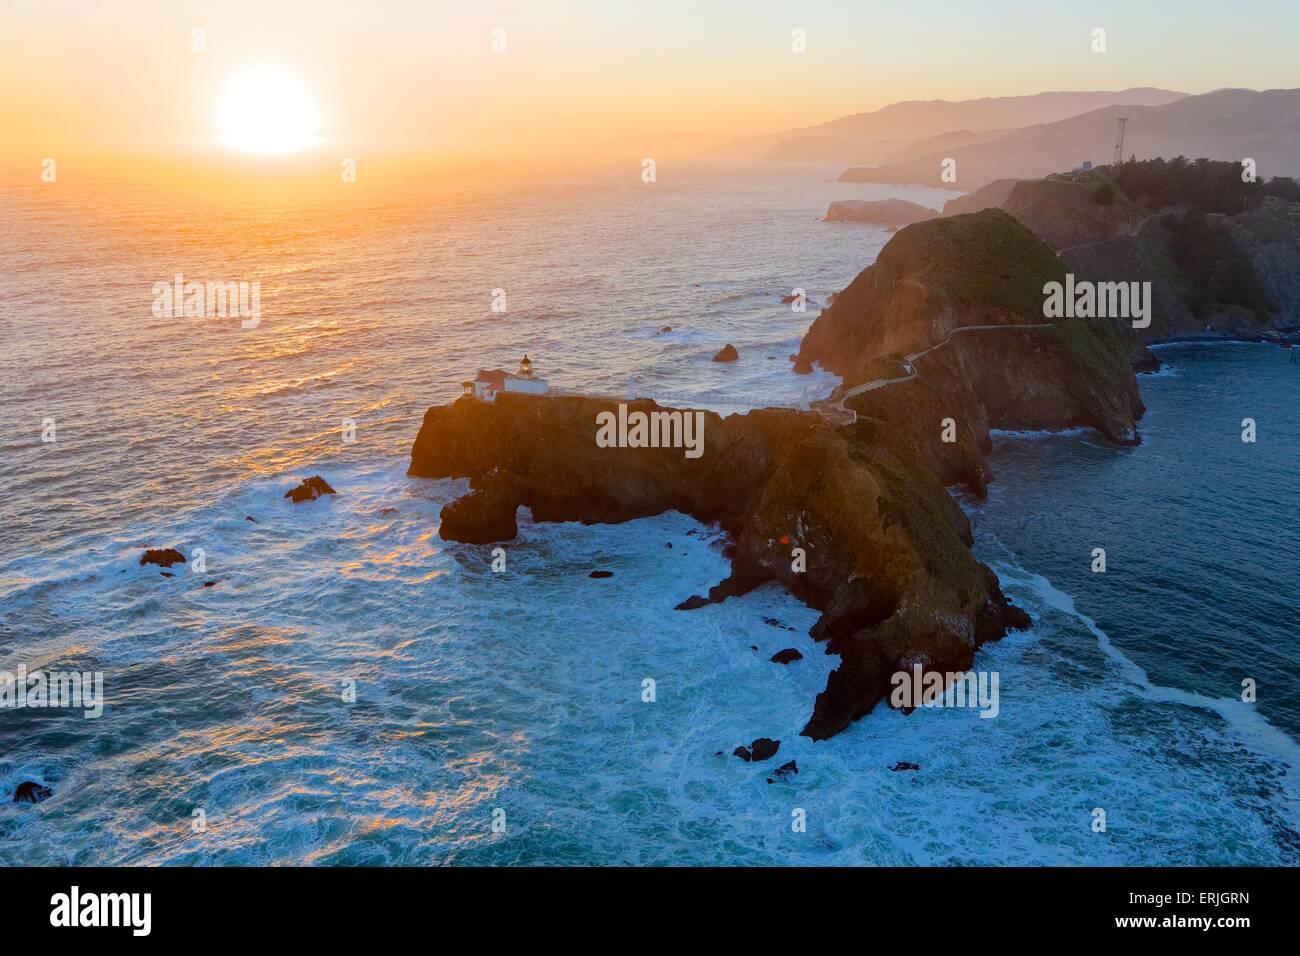 Vista aérea a través de faro de Punta Bonita en Marin, cerca de San Francisco al atardecer Imagen De Stock